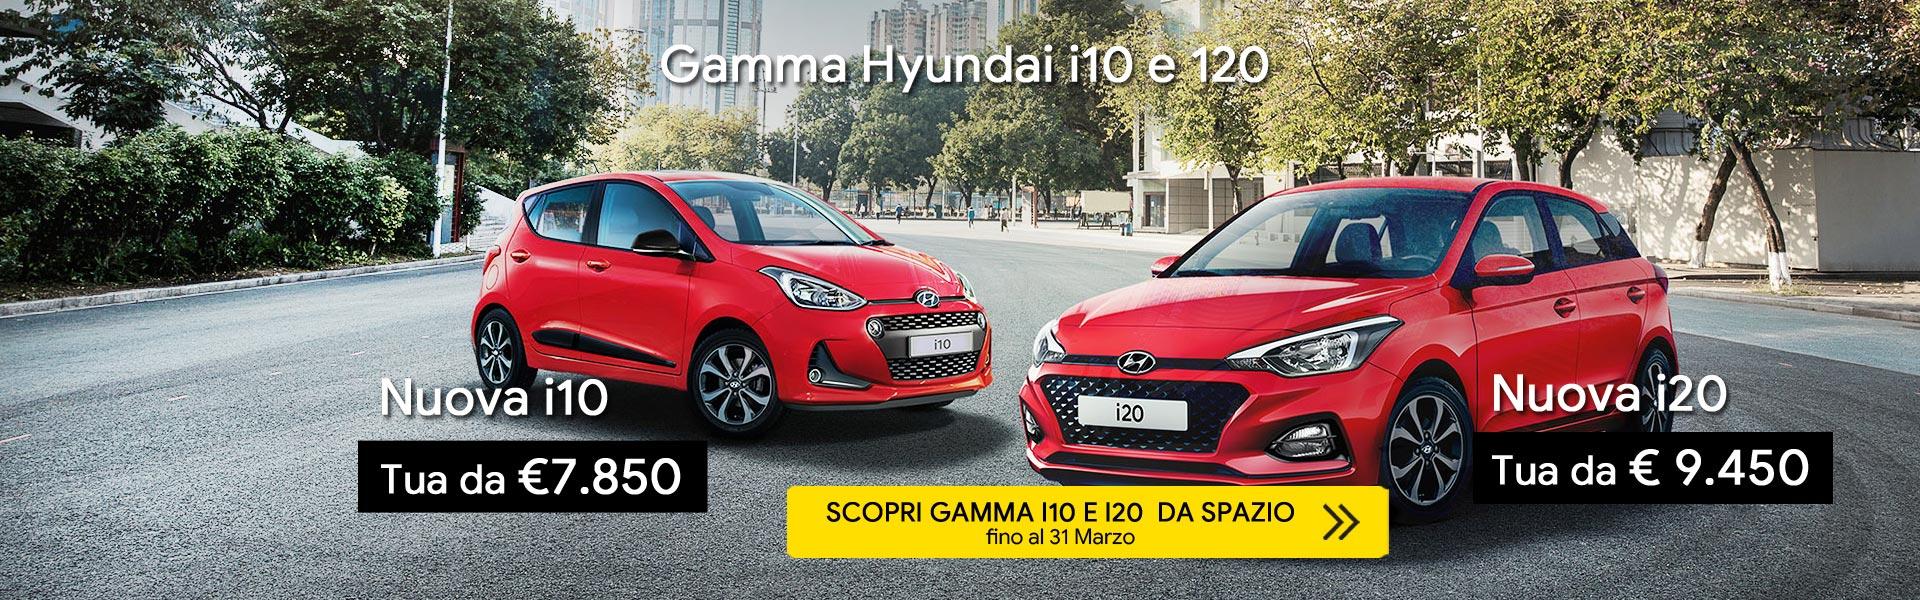 Hyundai i10 e i20